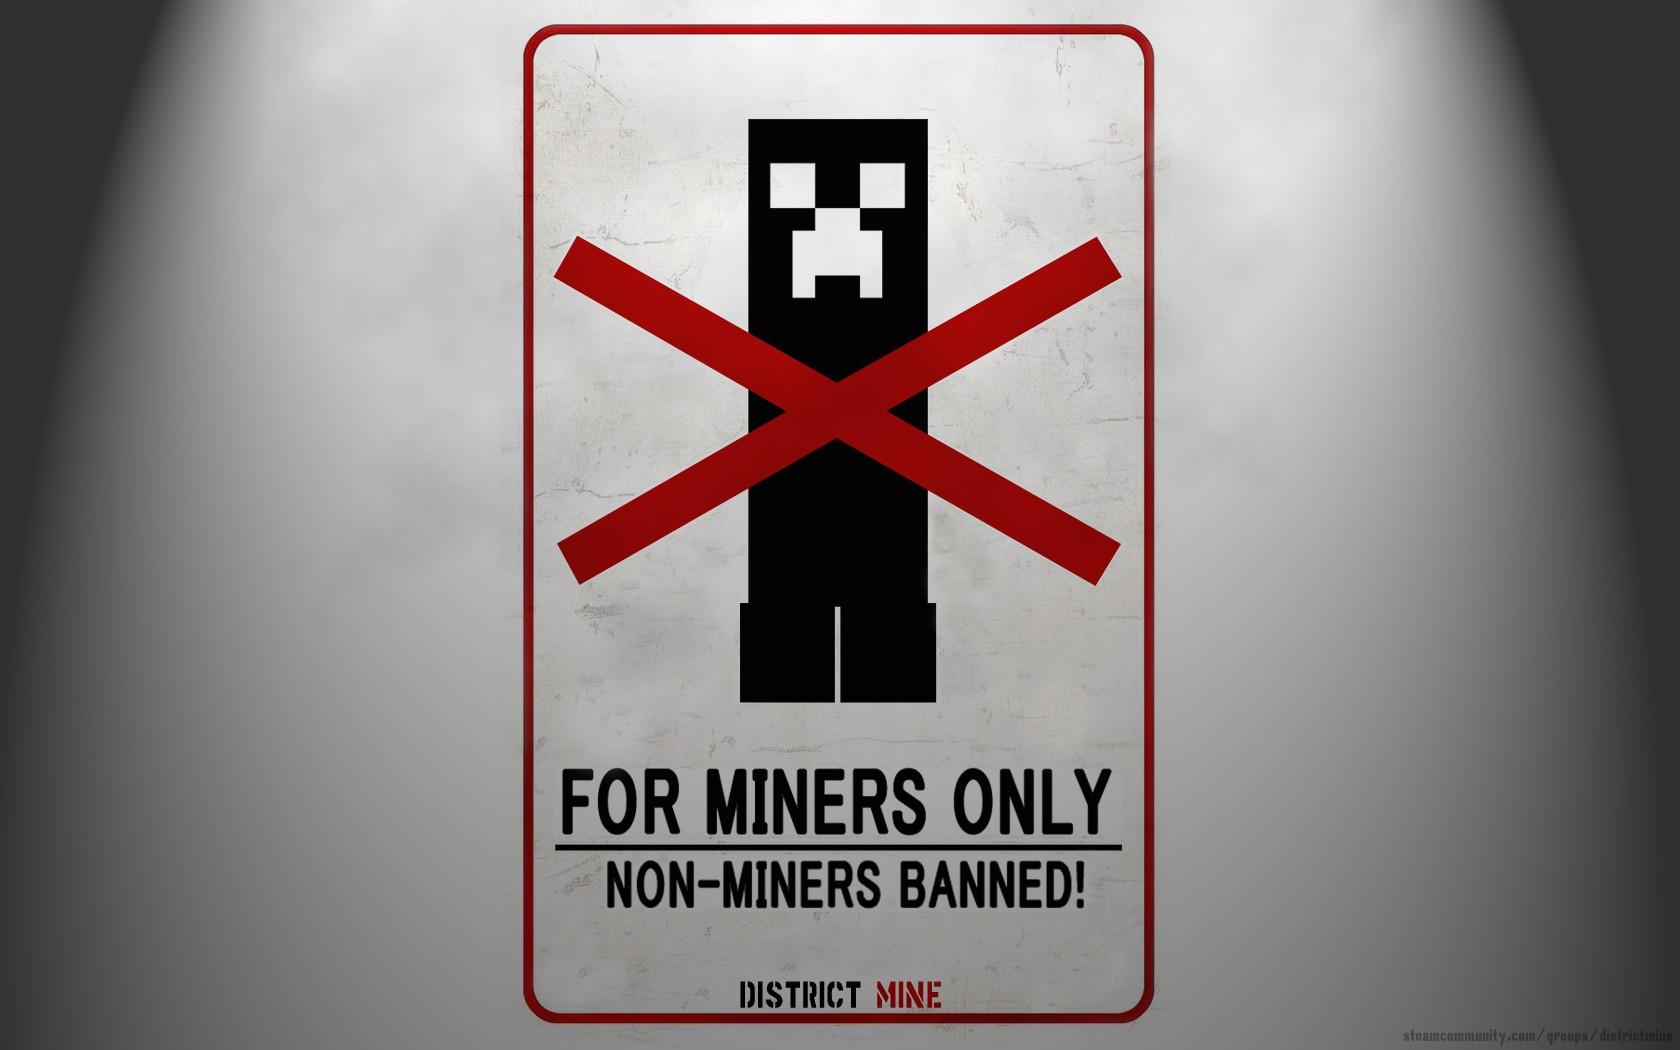 Good Wallpaper Minecraft Poster - video-games-logo-Minecraft-creeper-poster-brand-advertising-symbol-number-font-232895  Gallery_949164.jpg